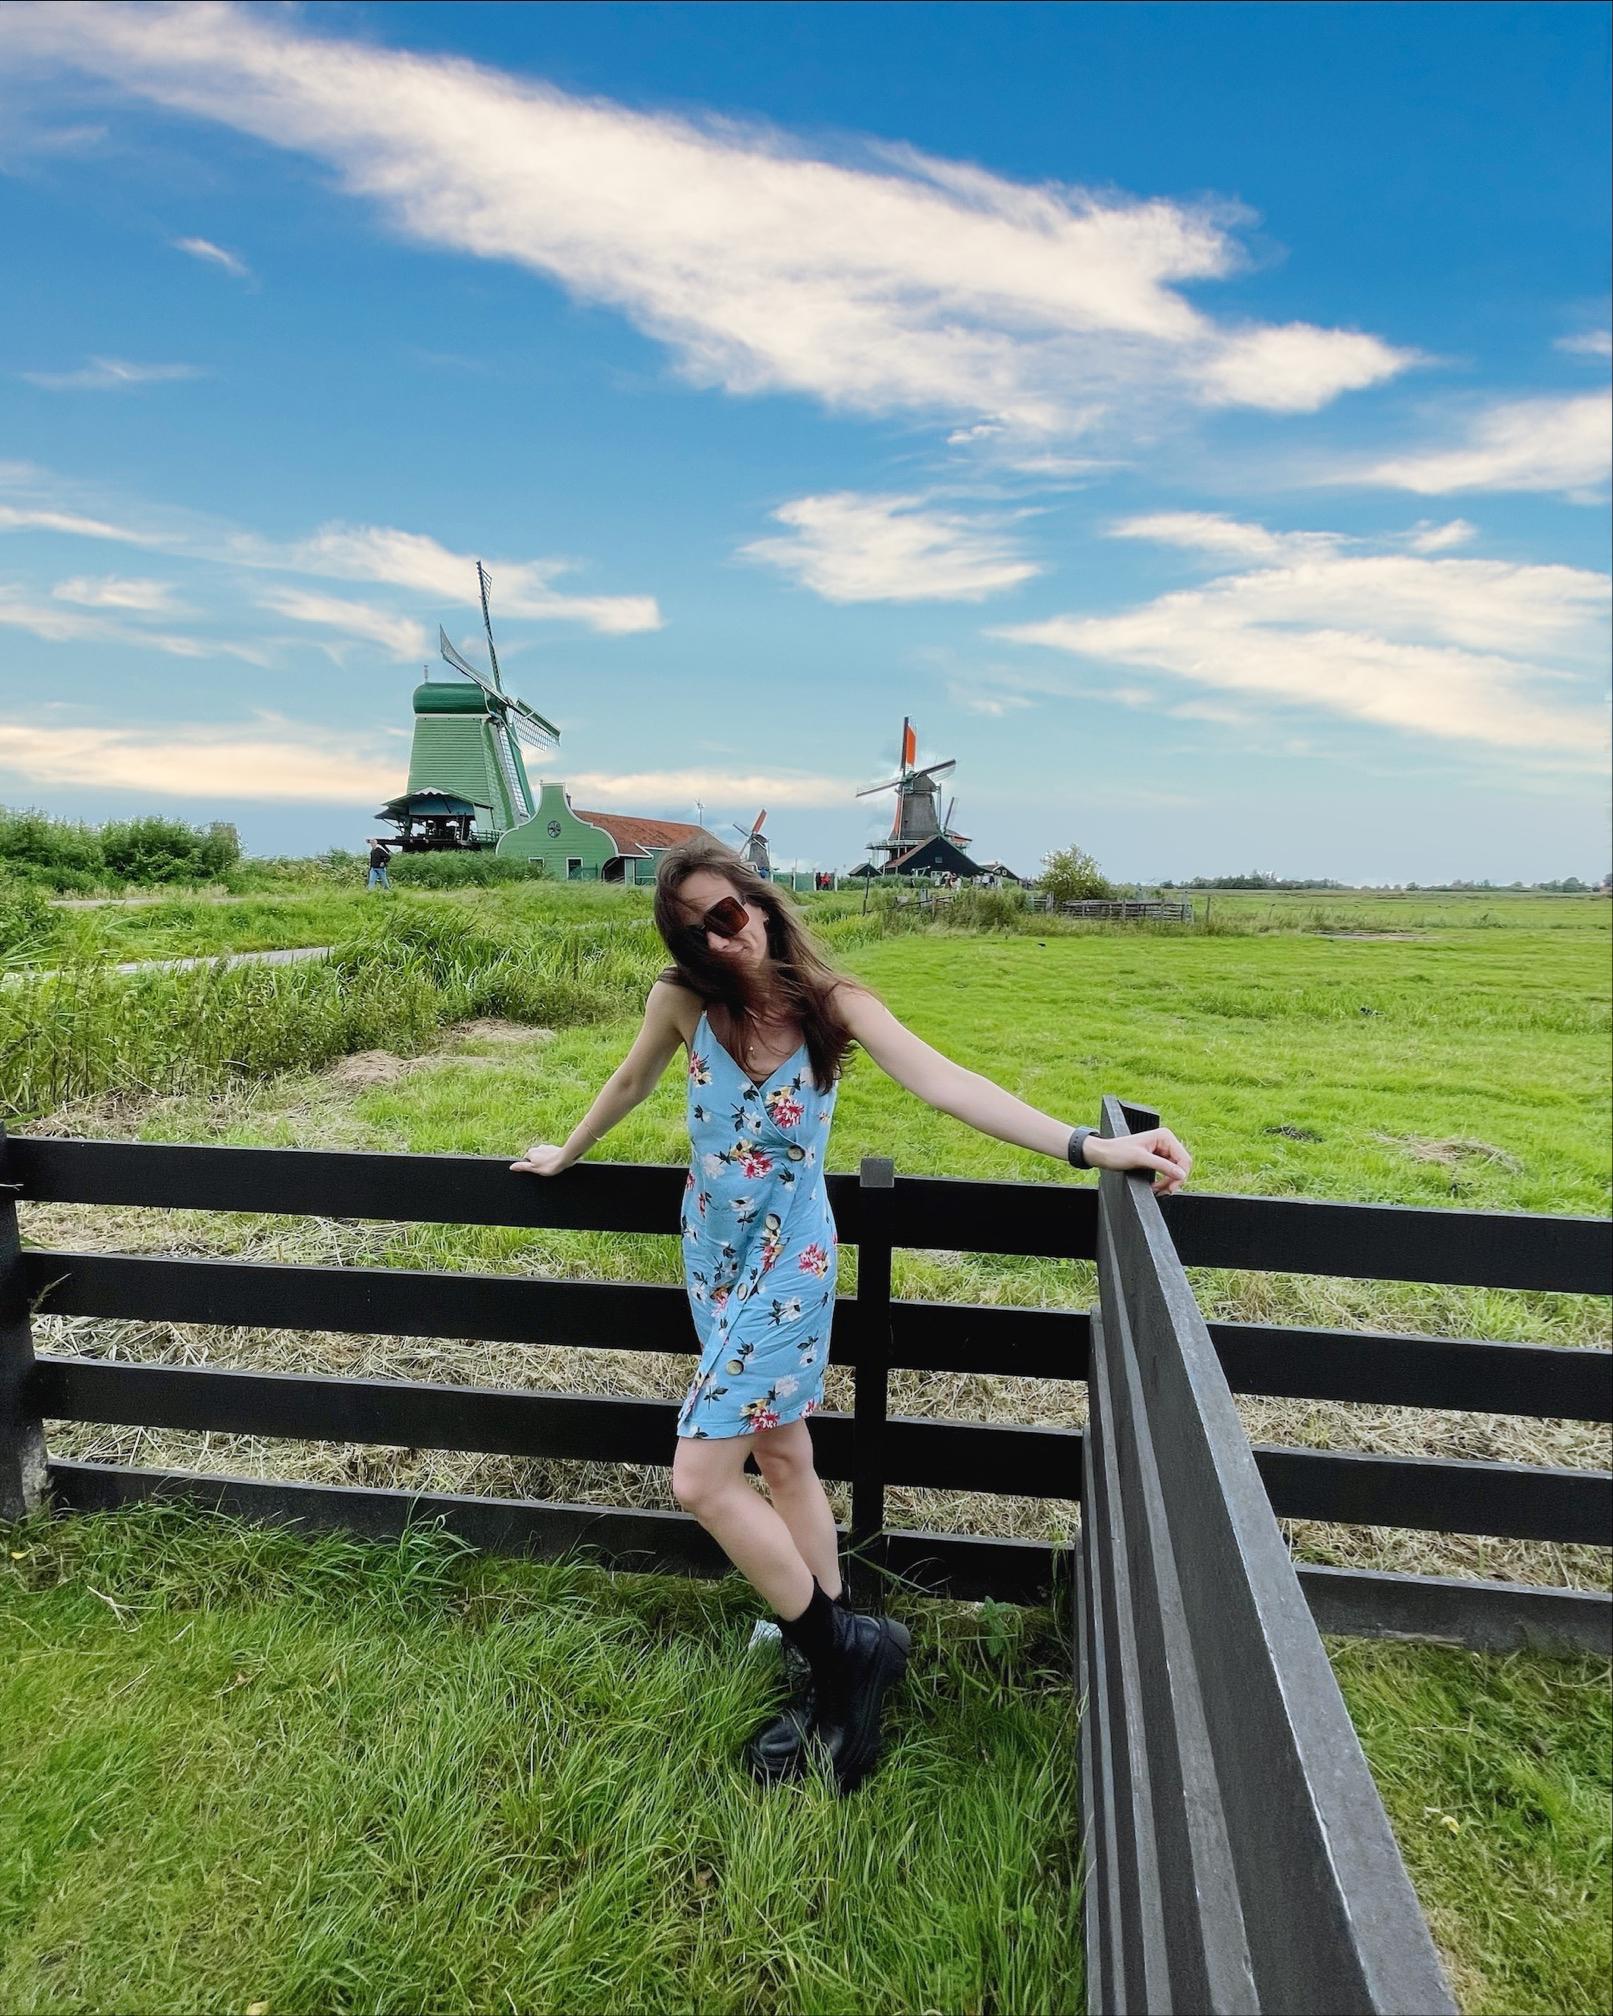 Expat joying the Dutch sights